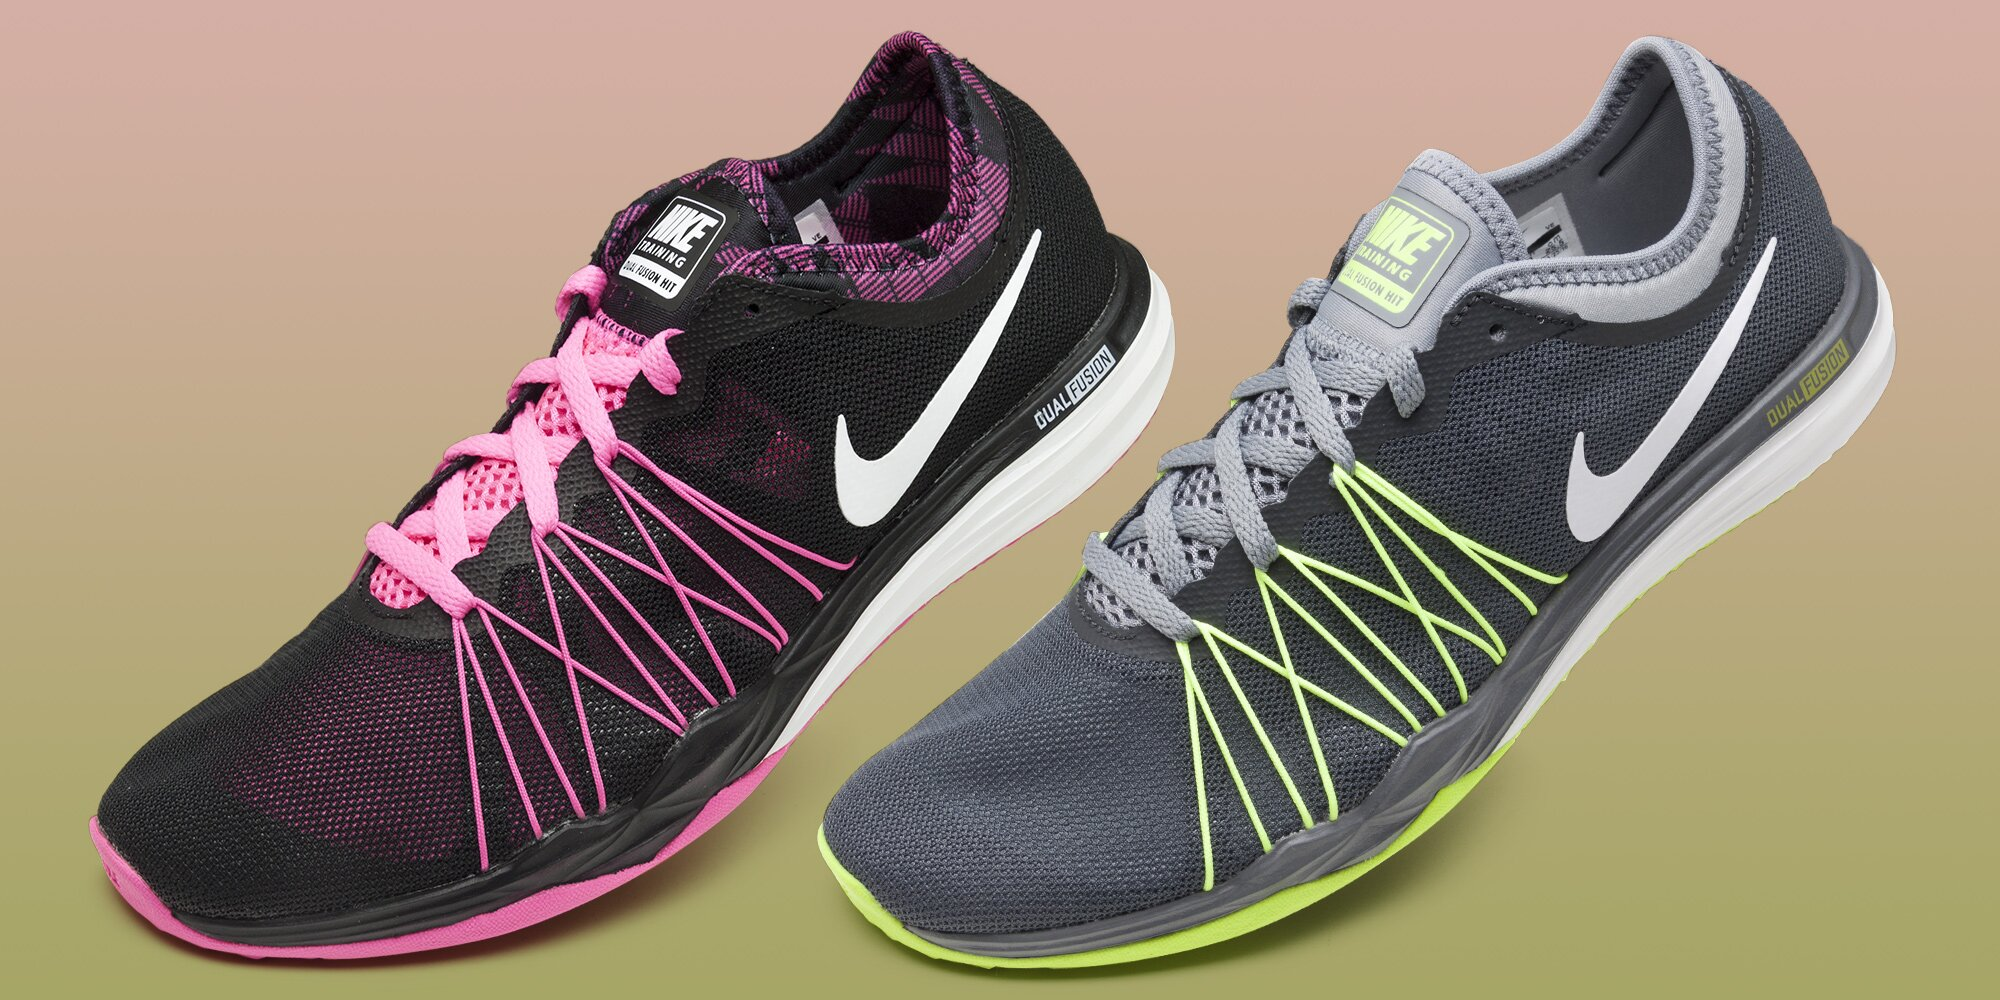 Dámské fitness boty Nike Dual Fusion  a13f9b8a321